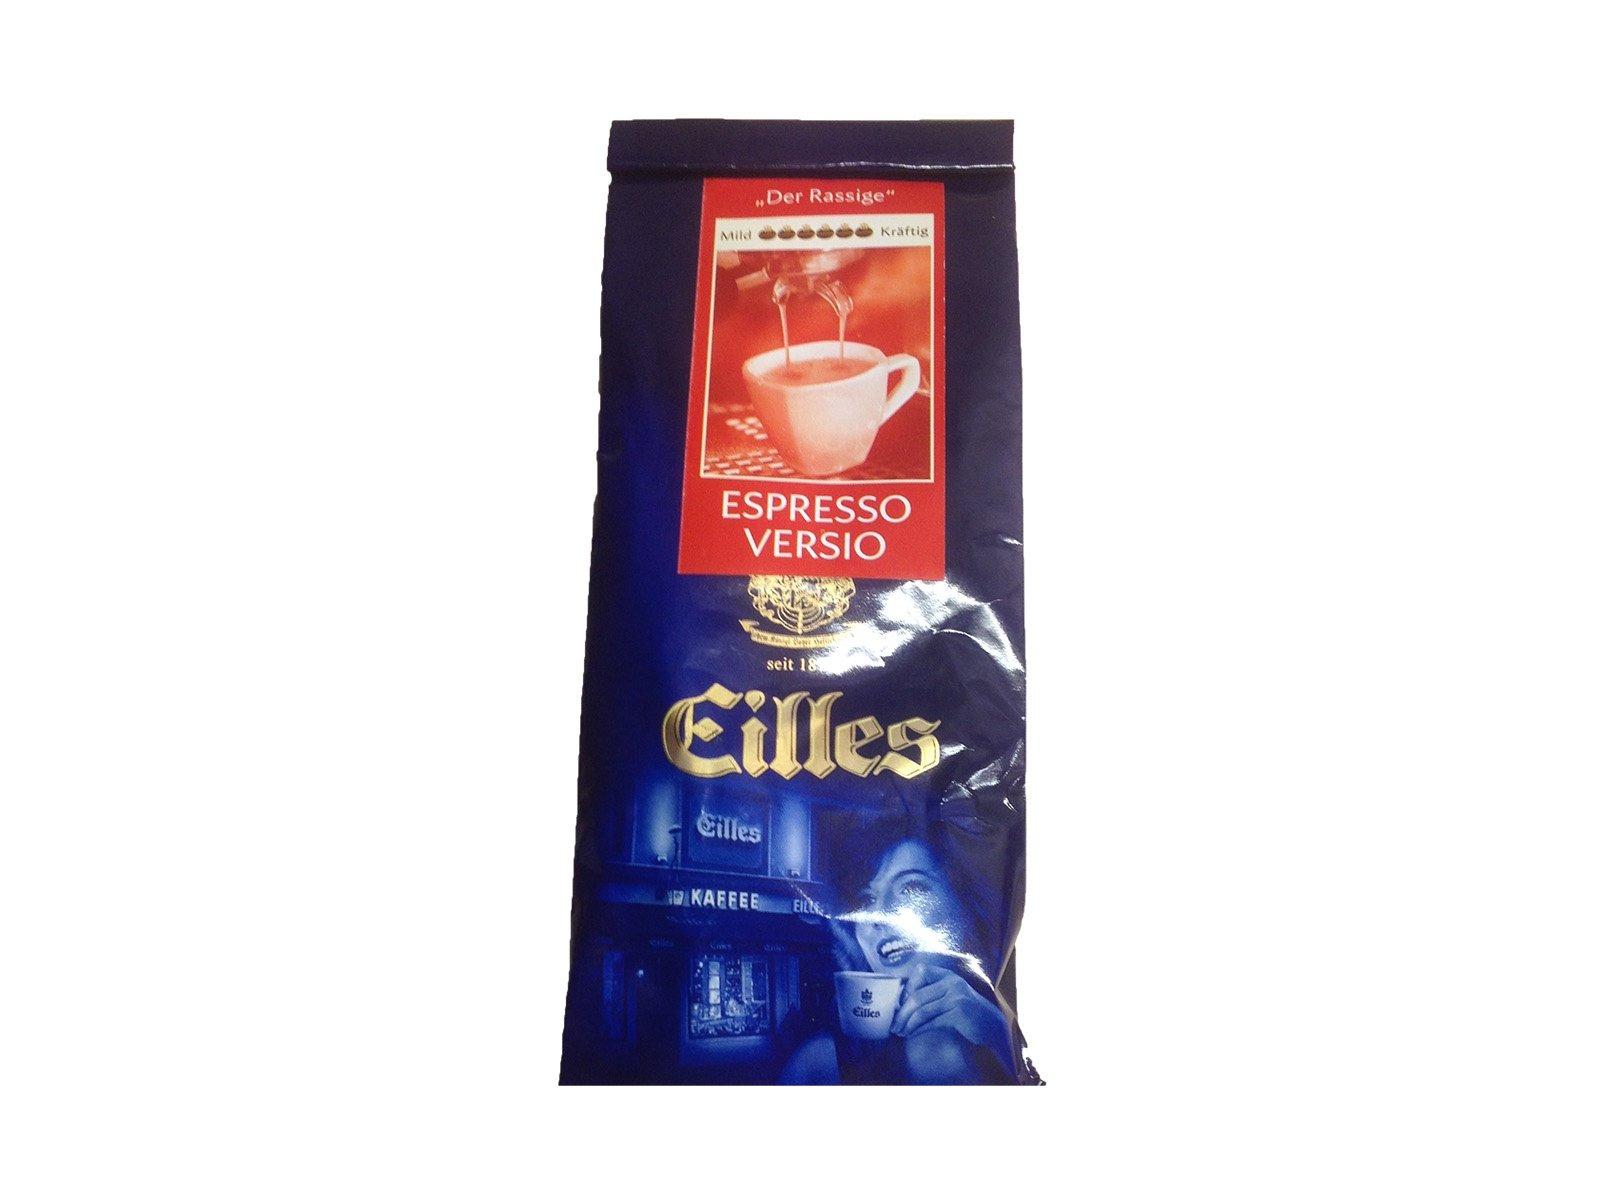 Eilles Espresso Versio